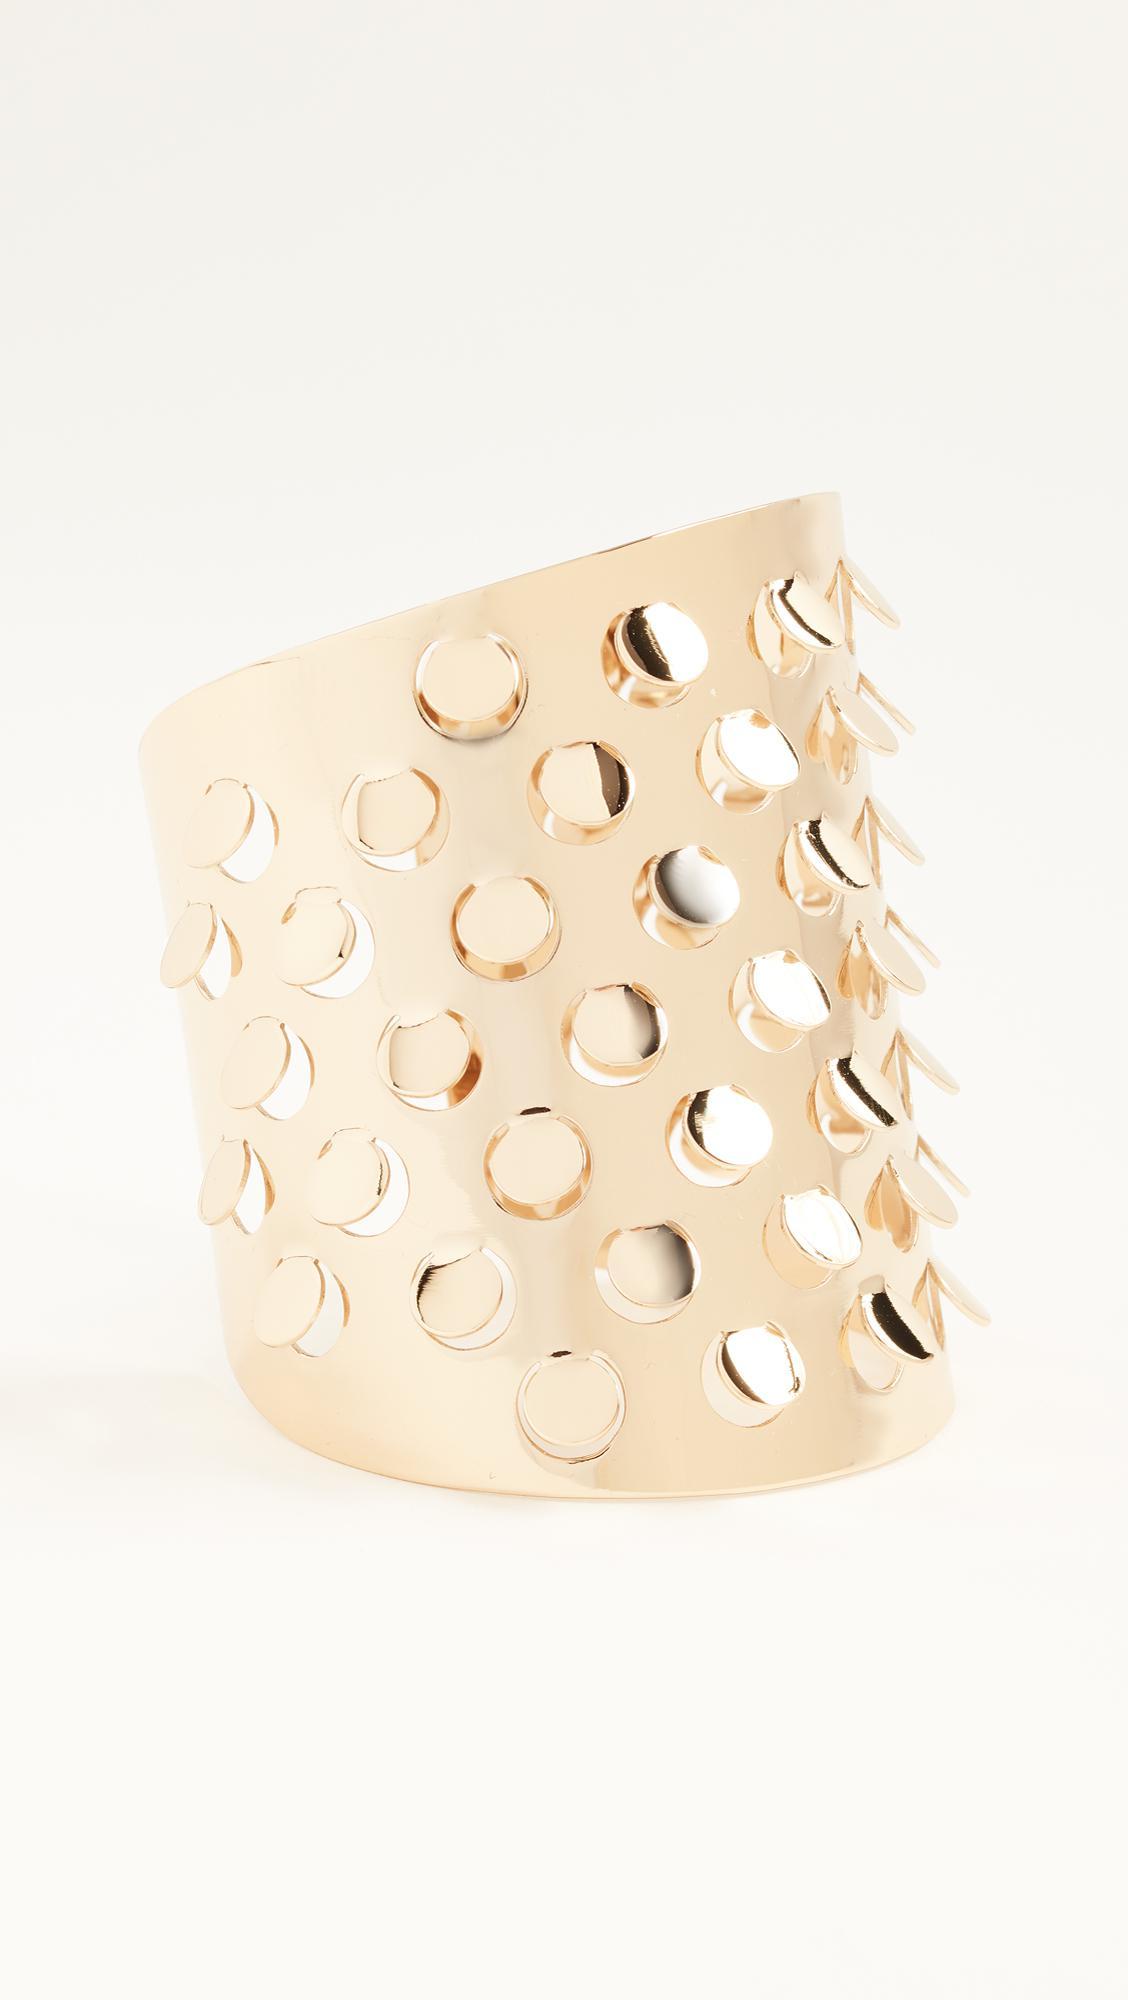 Alexis Bittar Grater Cuff Bracelet 4eSKFfQuma